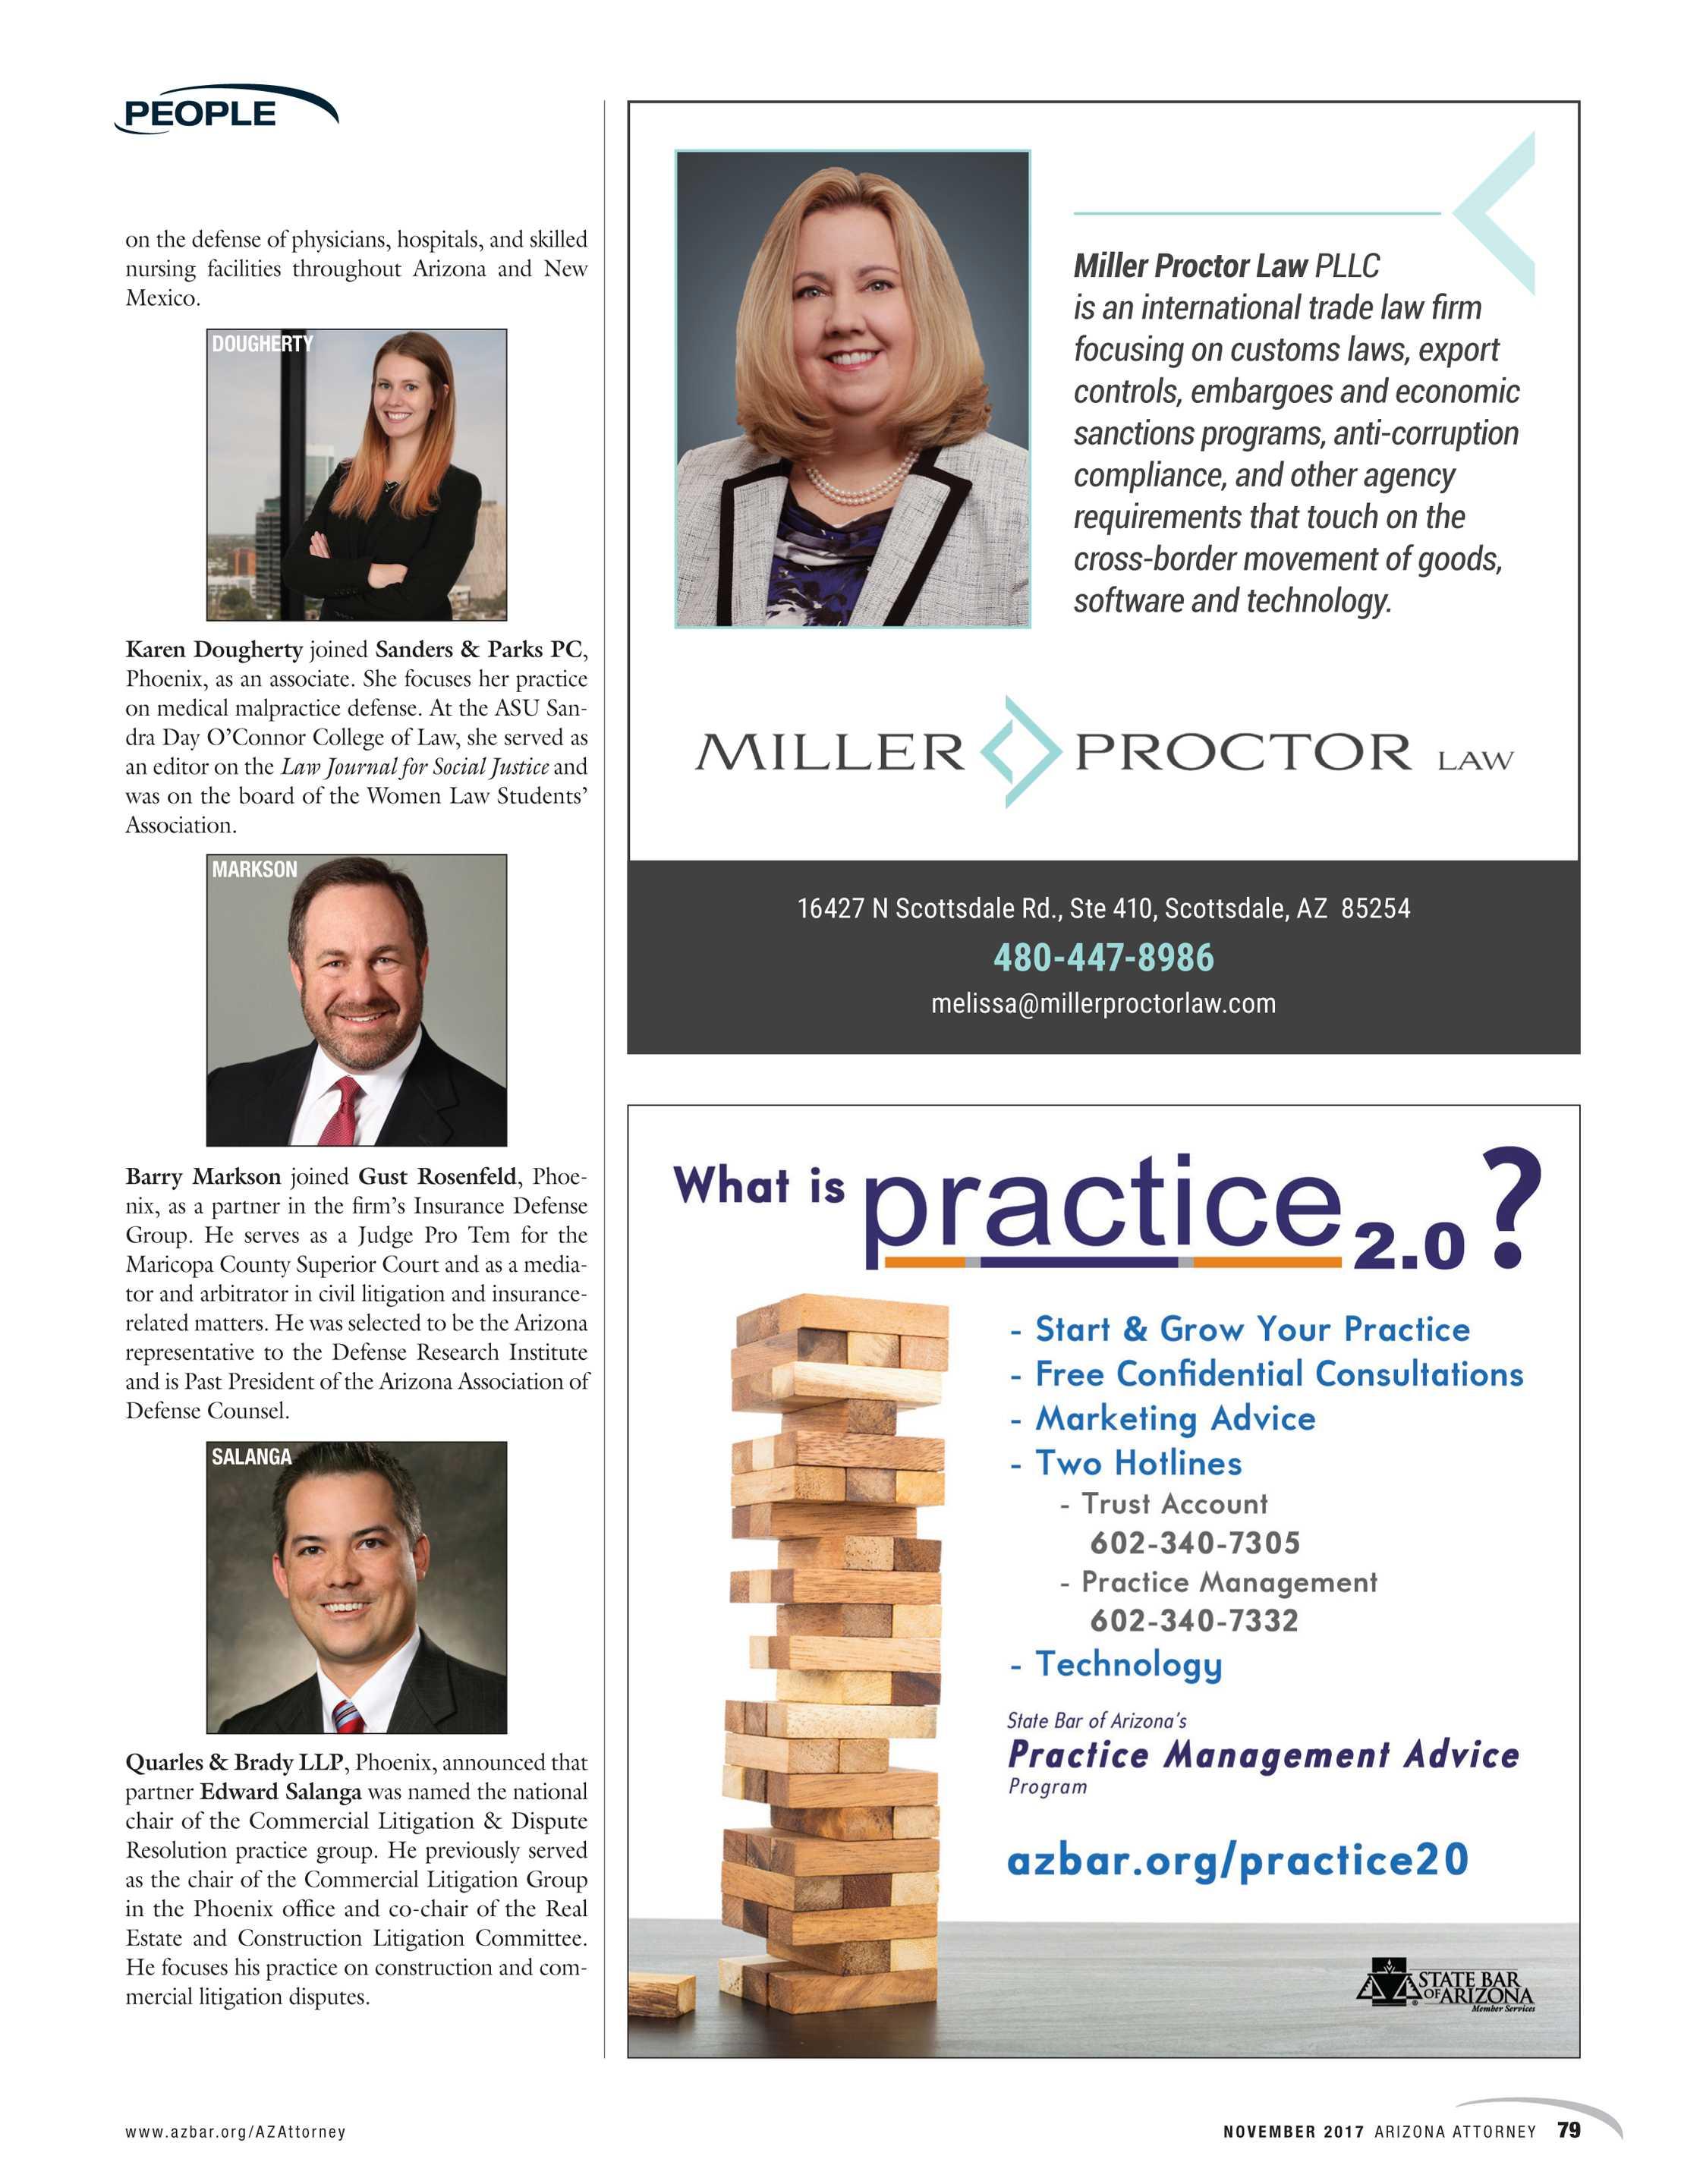 Arizona Attorney - November 2017 - page 78